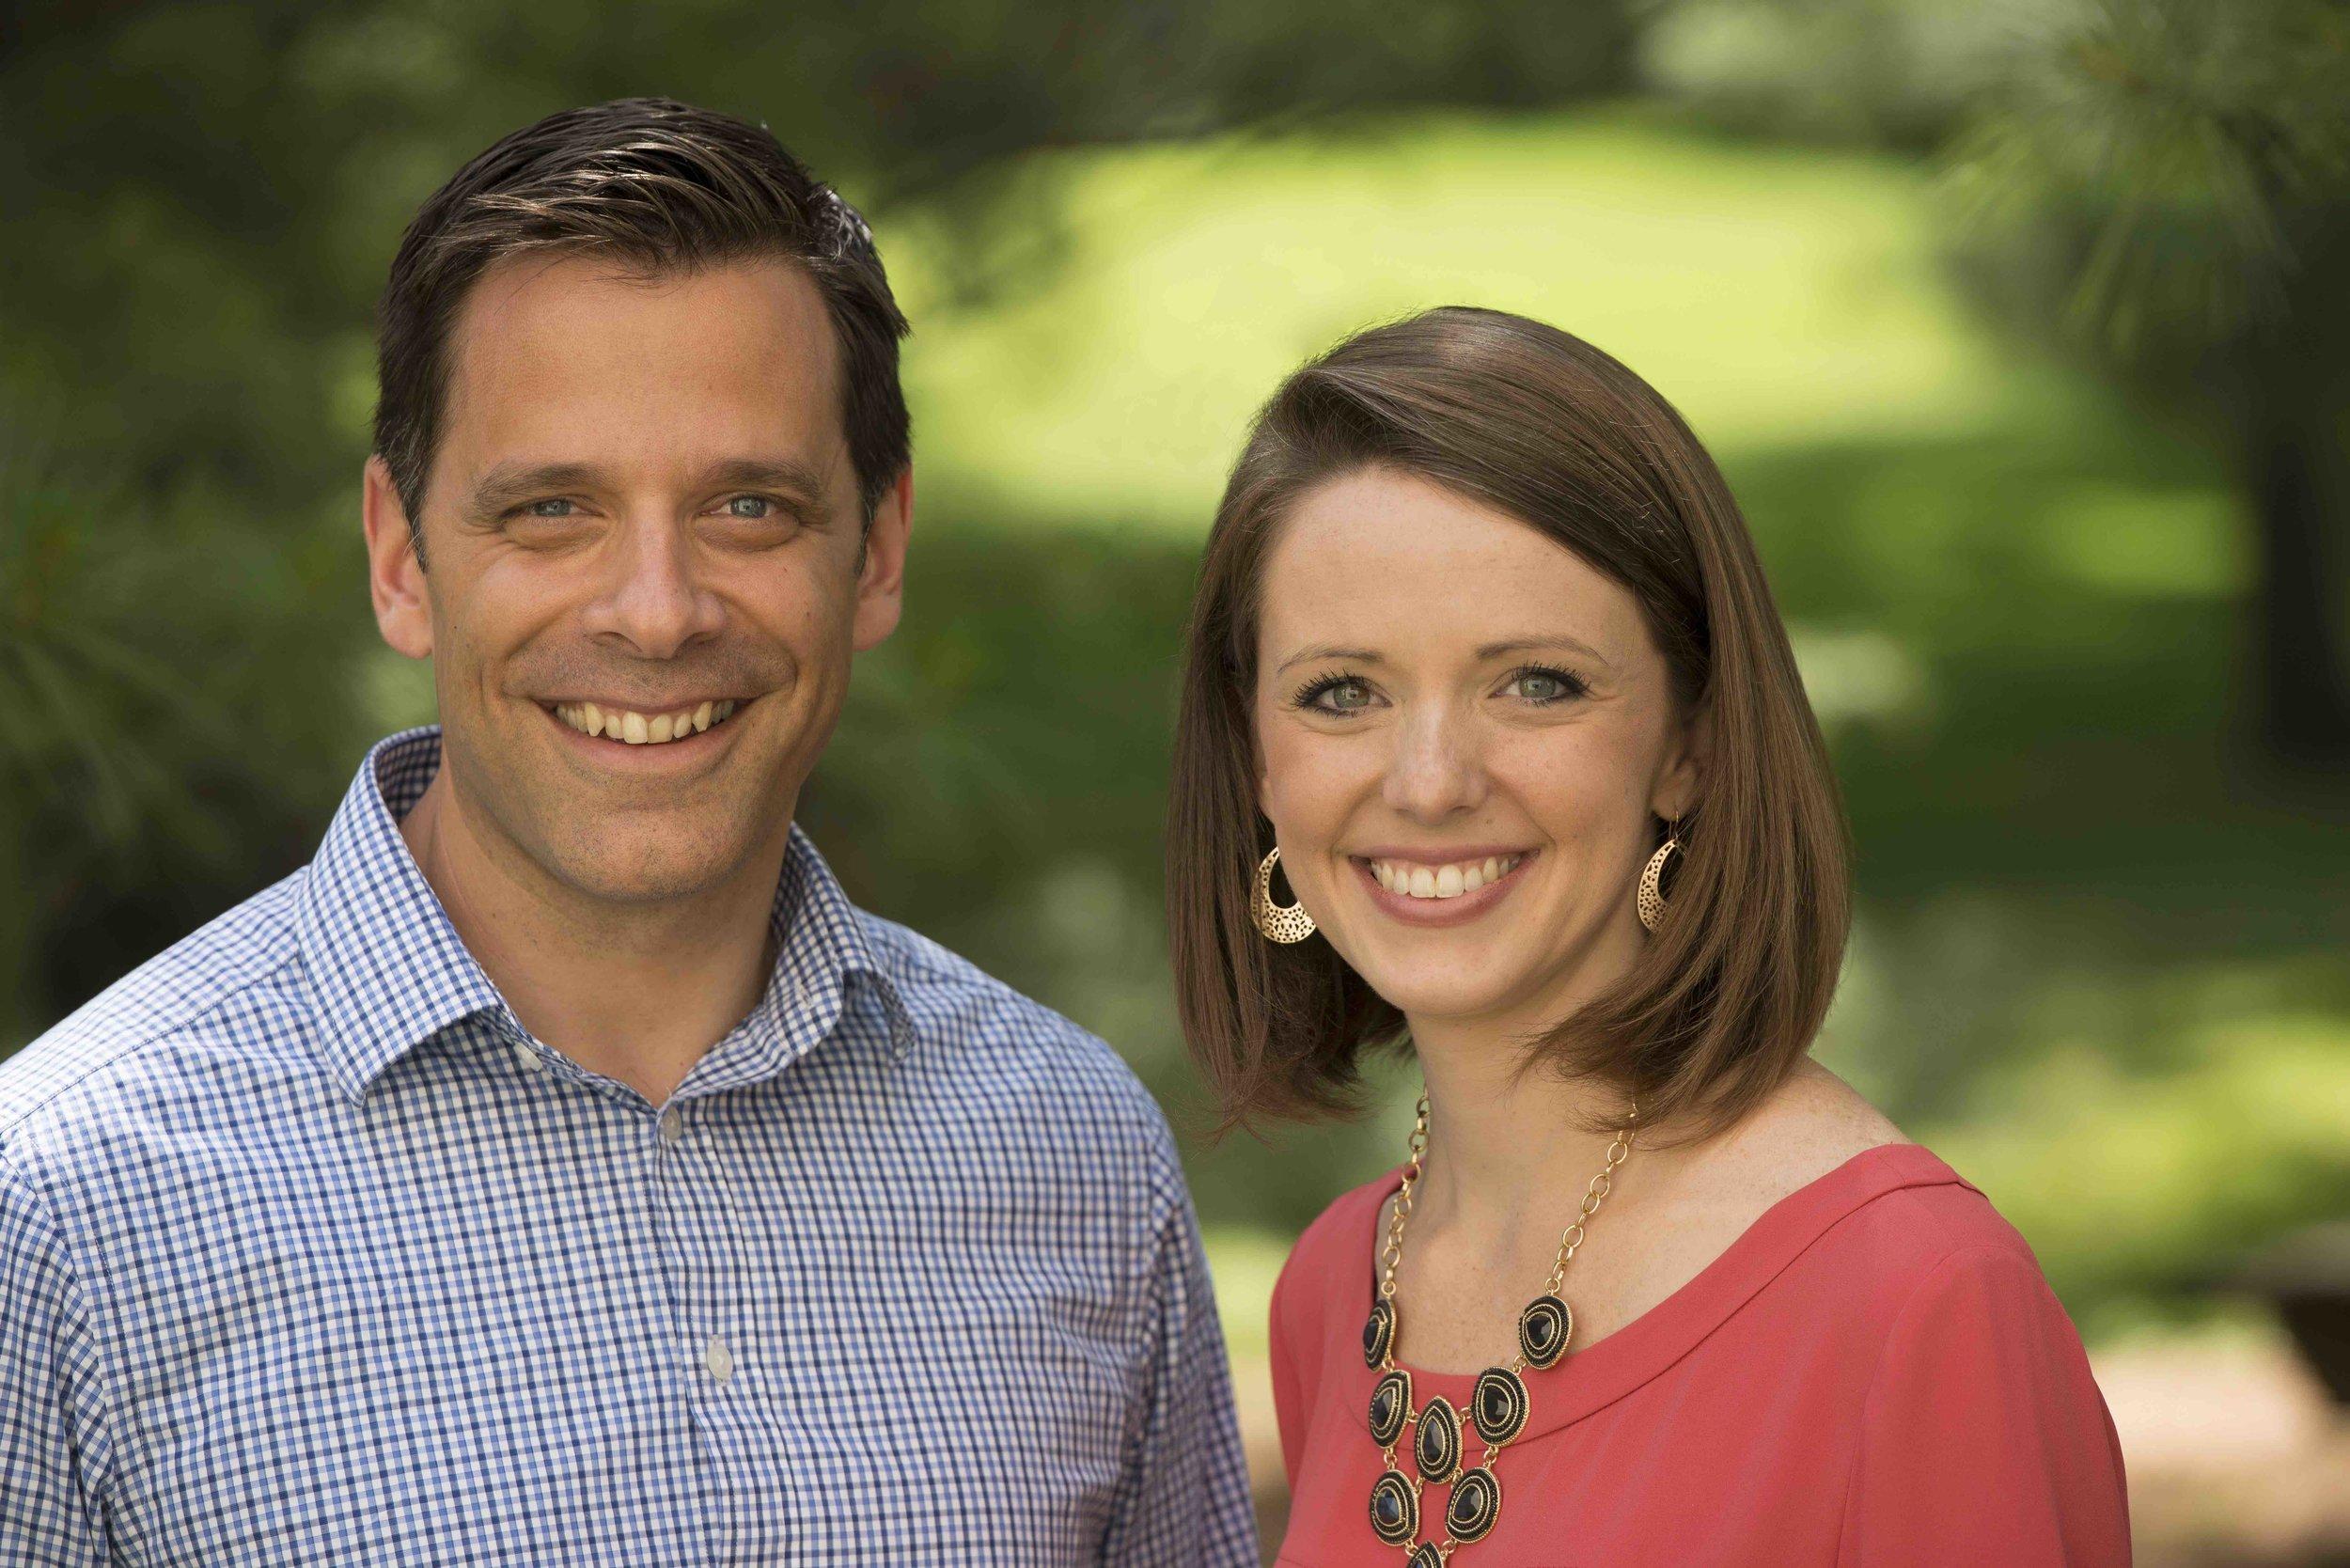 Dr. Rohal and Hannah Barry, R.N.